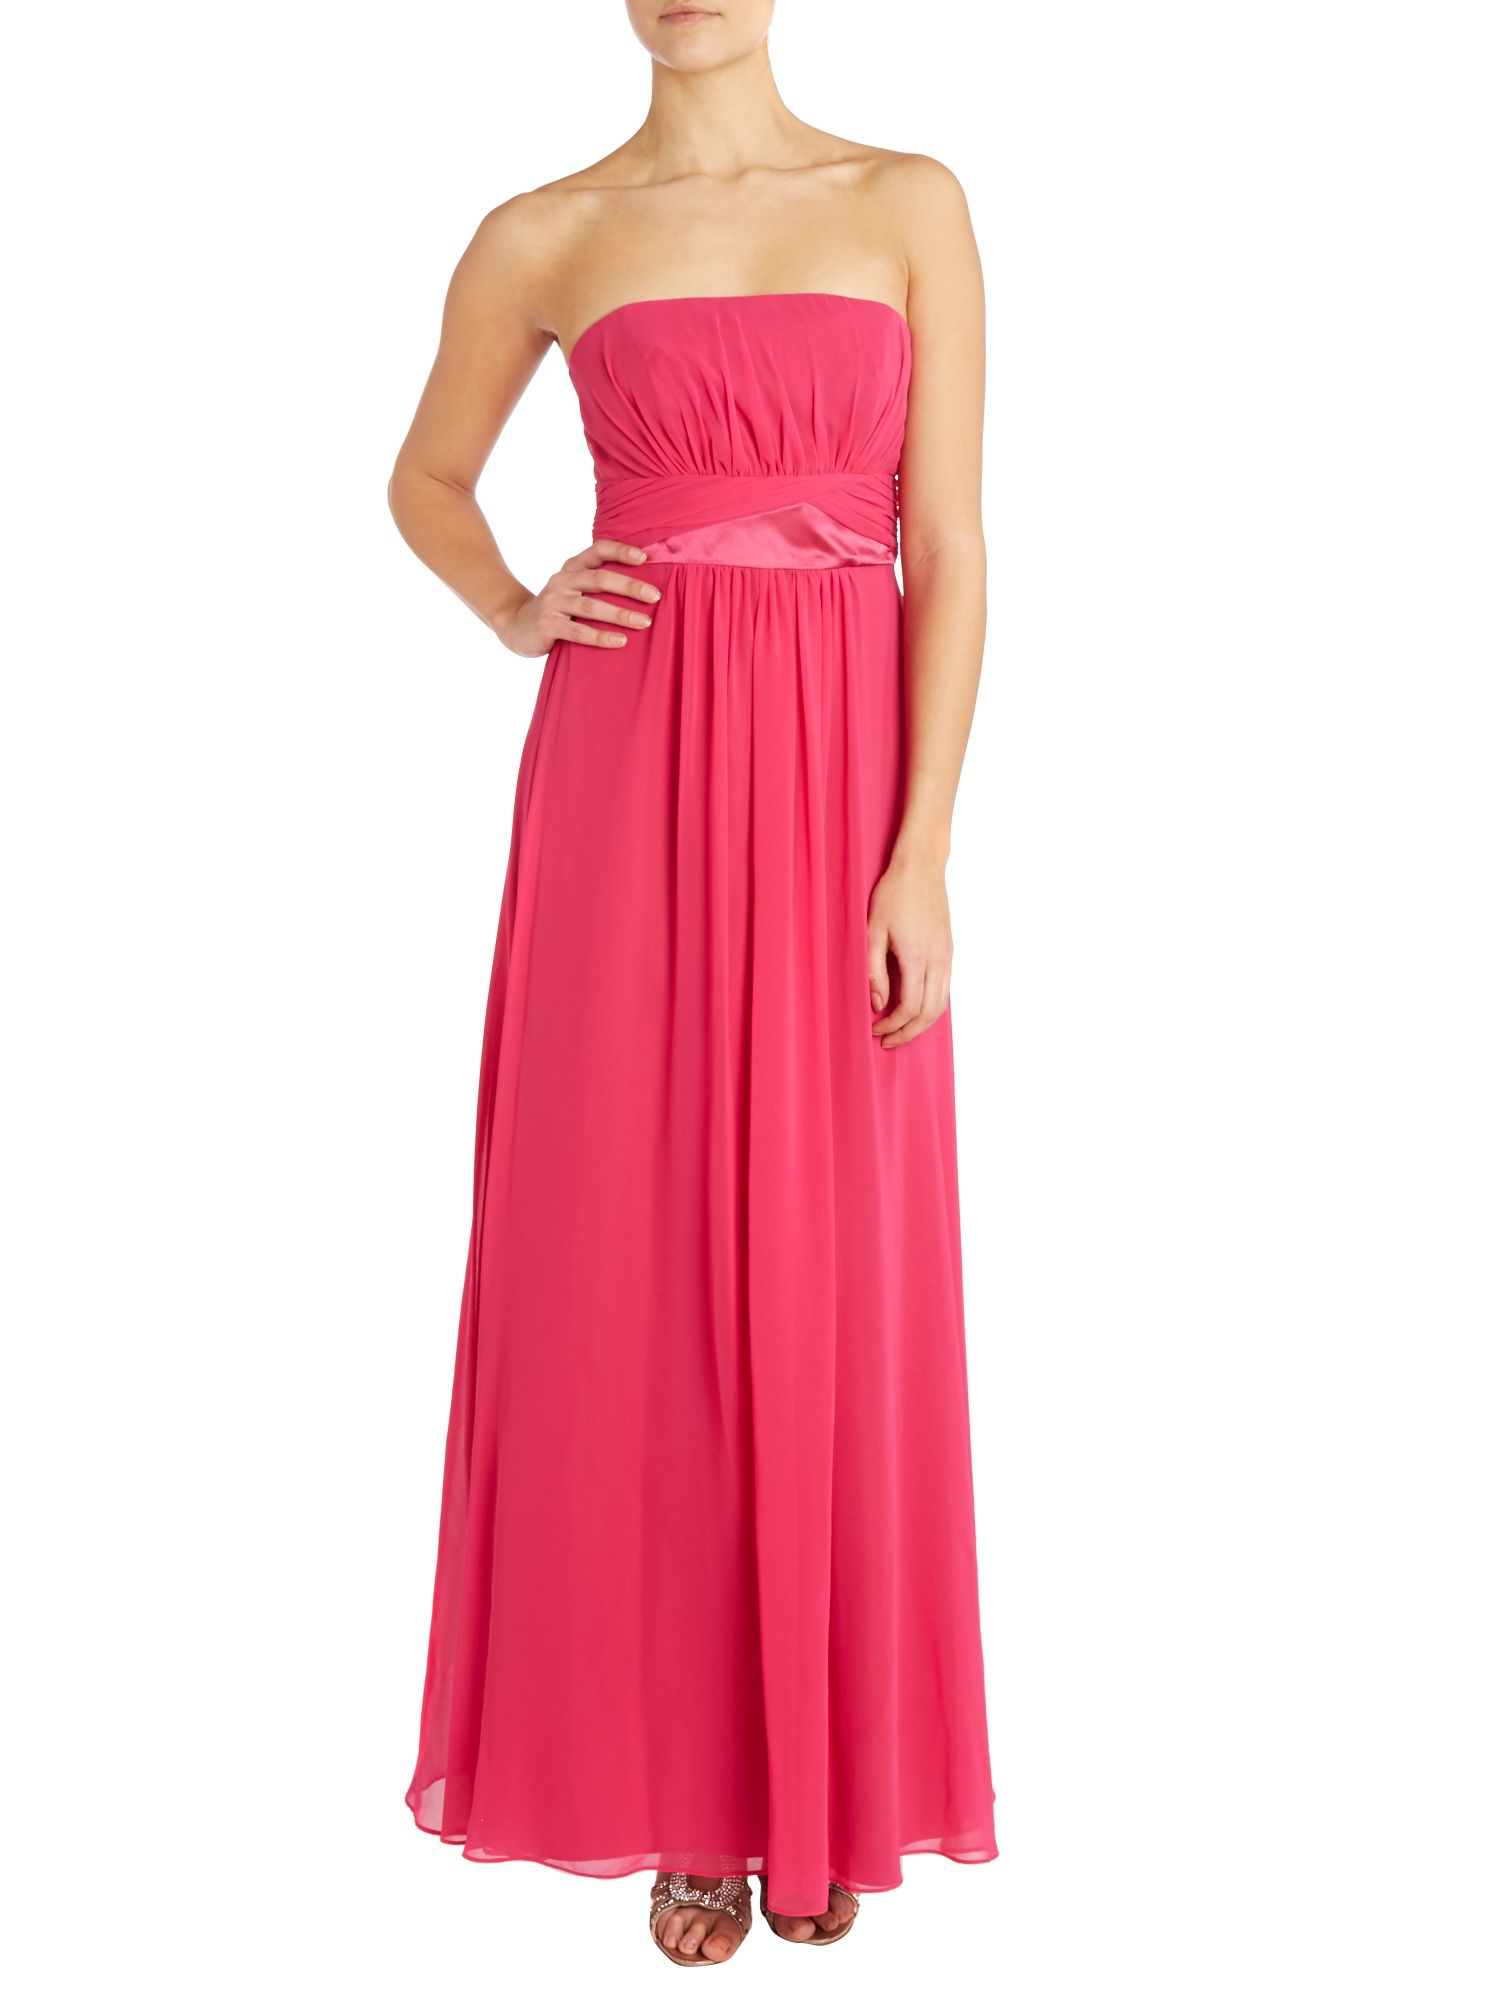 Ariella Bridesmaid Strapless Chiffon Dress in Pink Hot